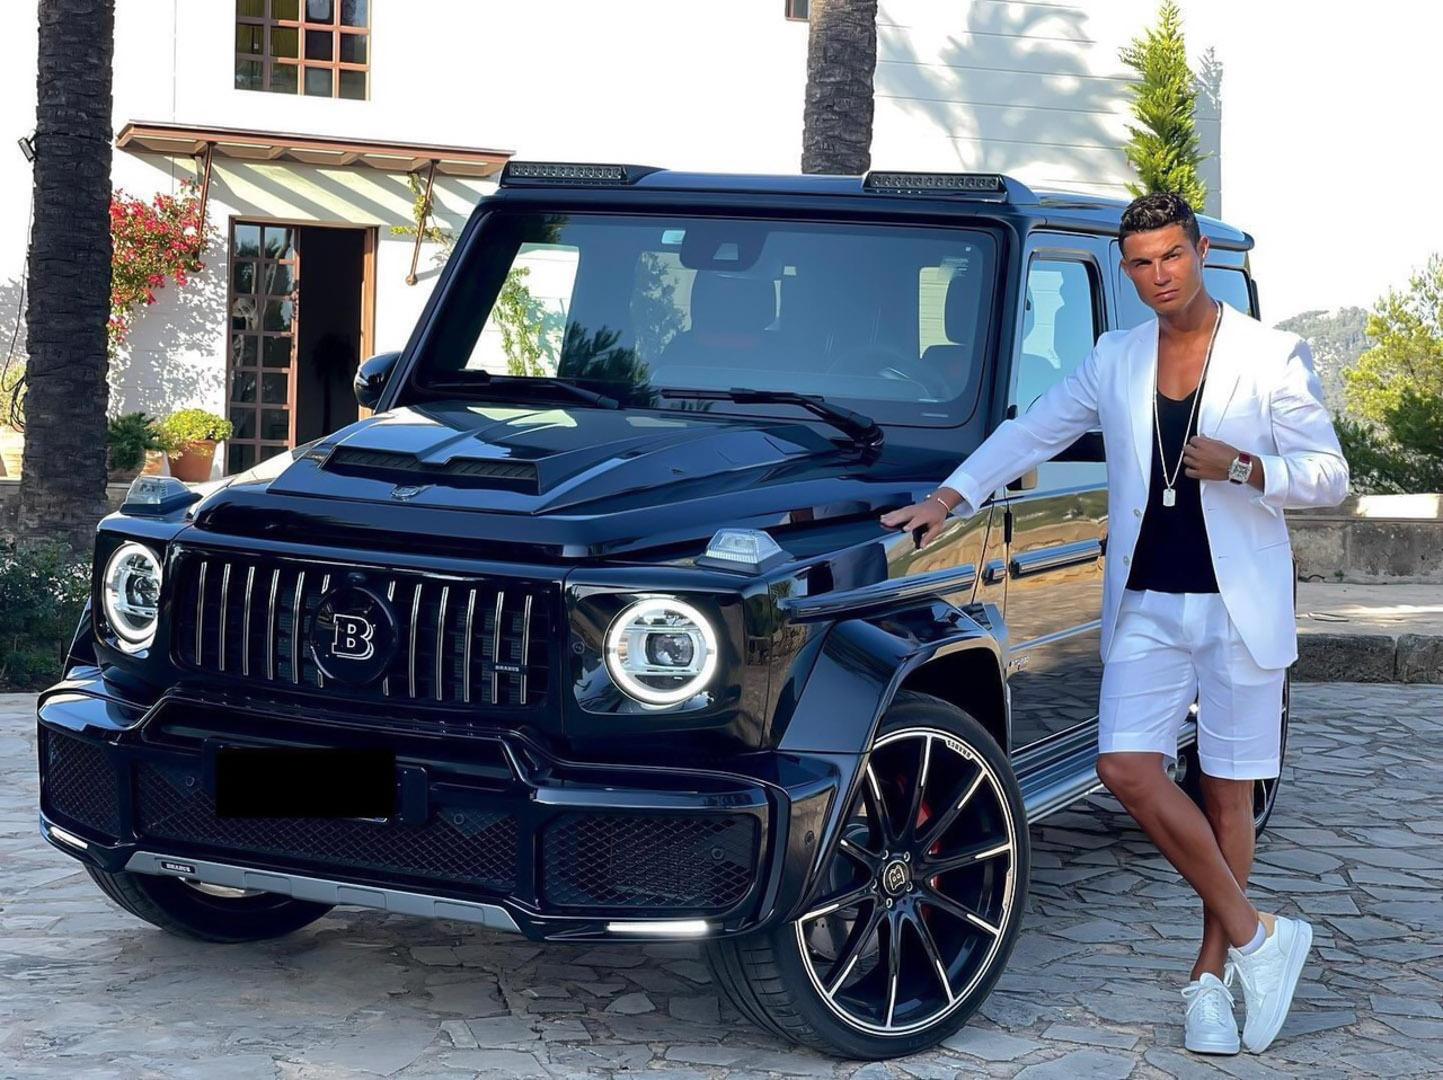 CP-Bộ sưu tập xe của Cristiano Ronaldo (33).jpg